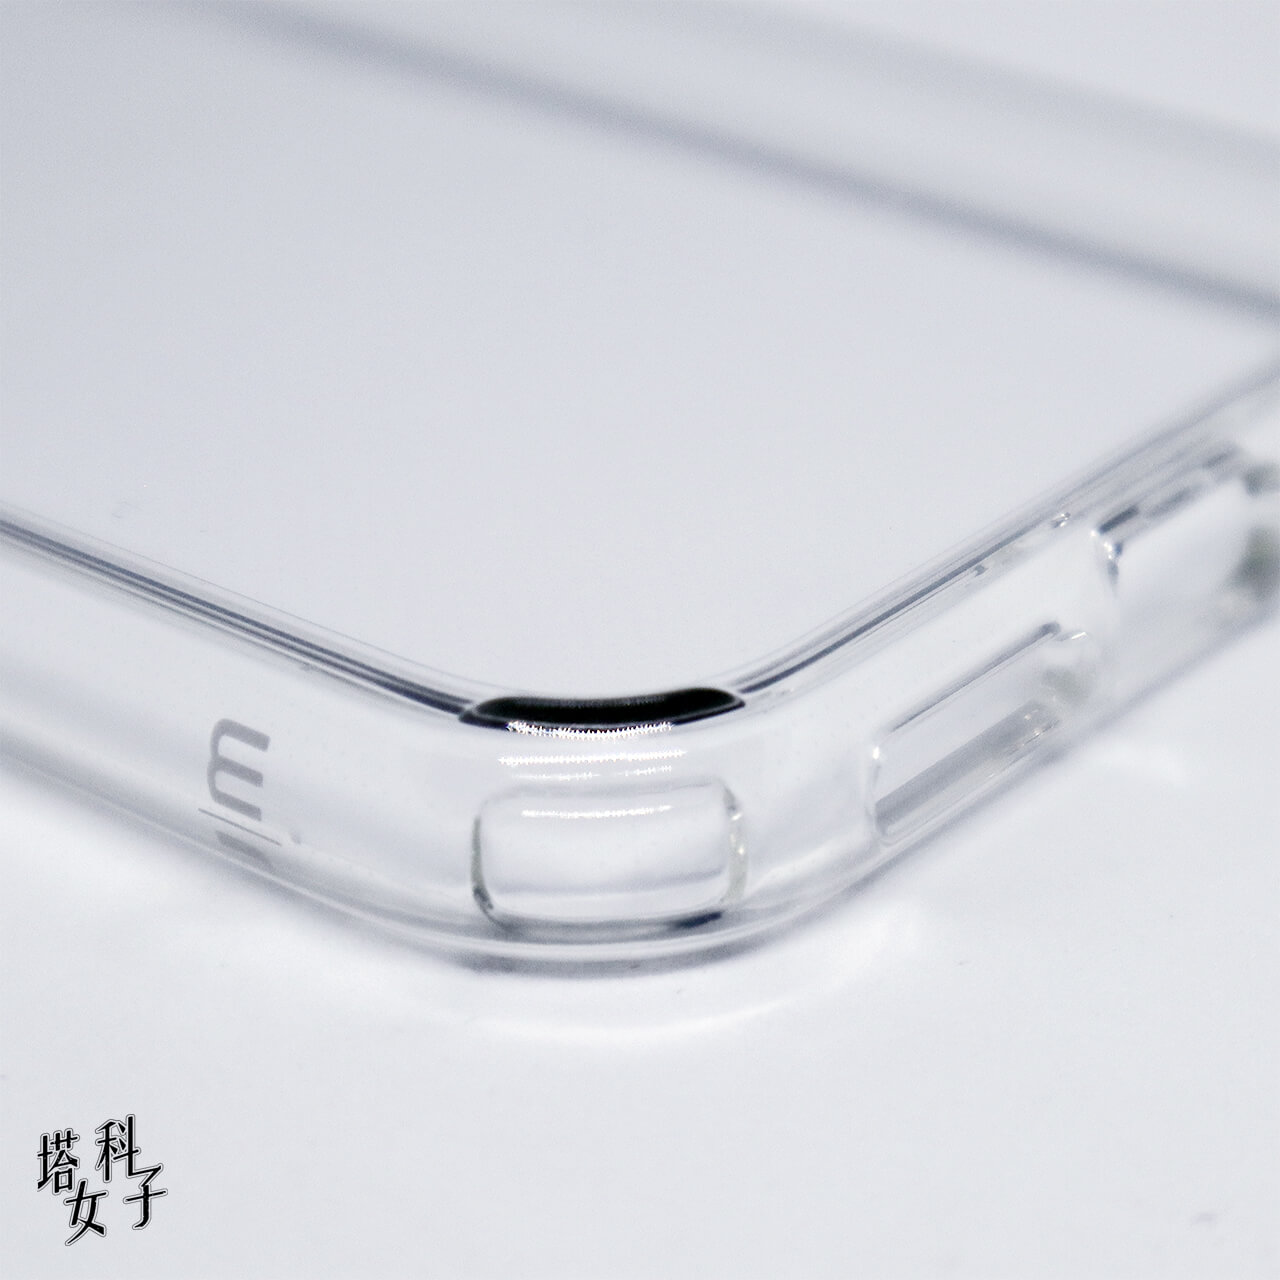 iPhone 11 TENC™ Air 國王新衣防摔氣墊殼 開箱評測 - 四角